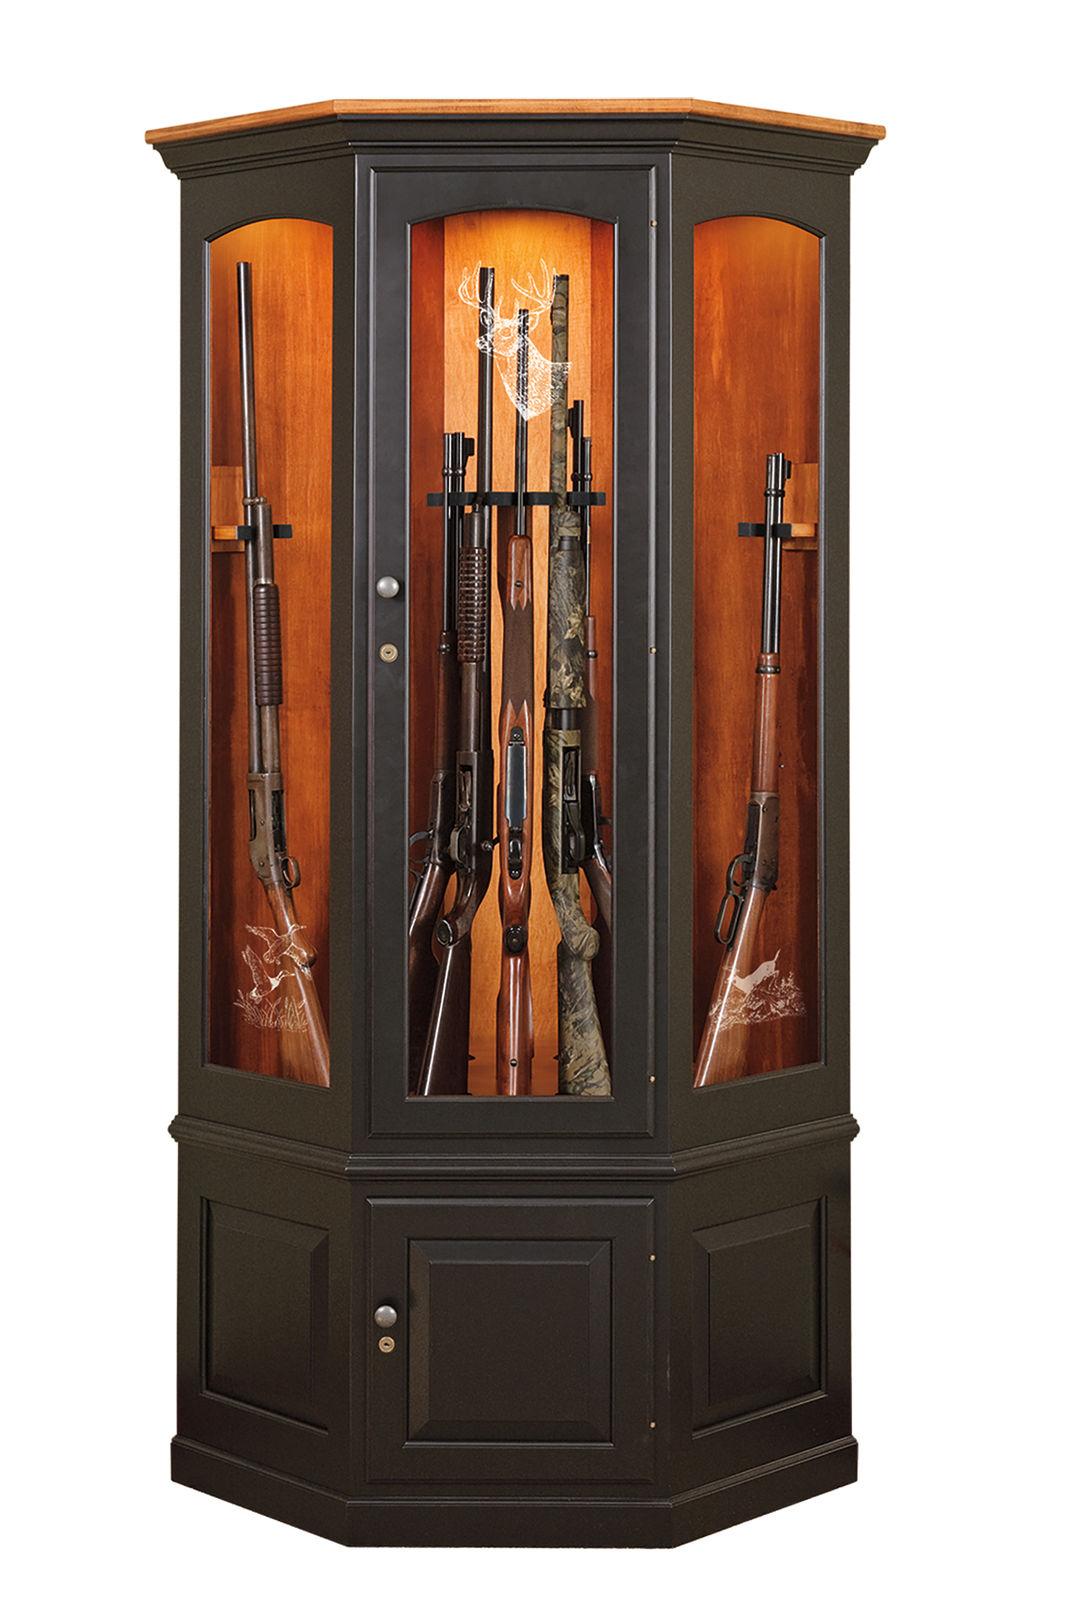 Photo of: JSW 14 Gun Corner Cabinet